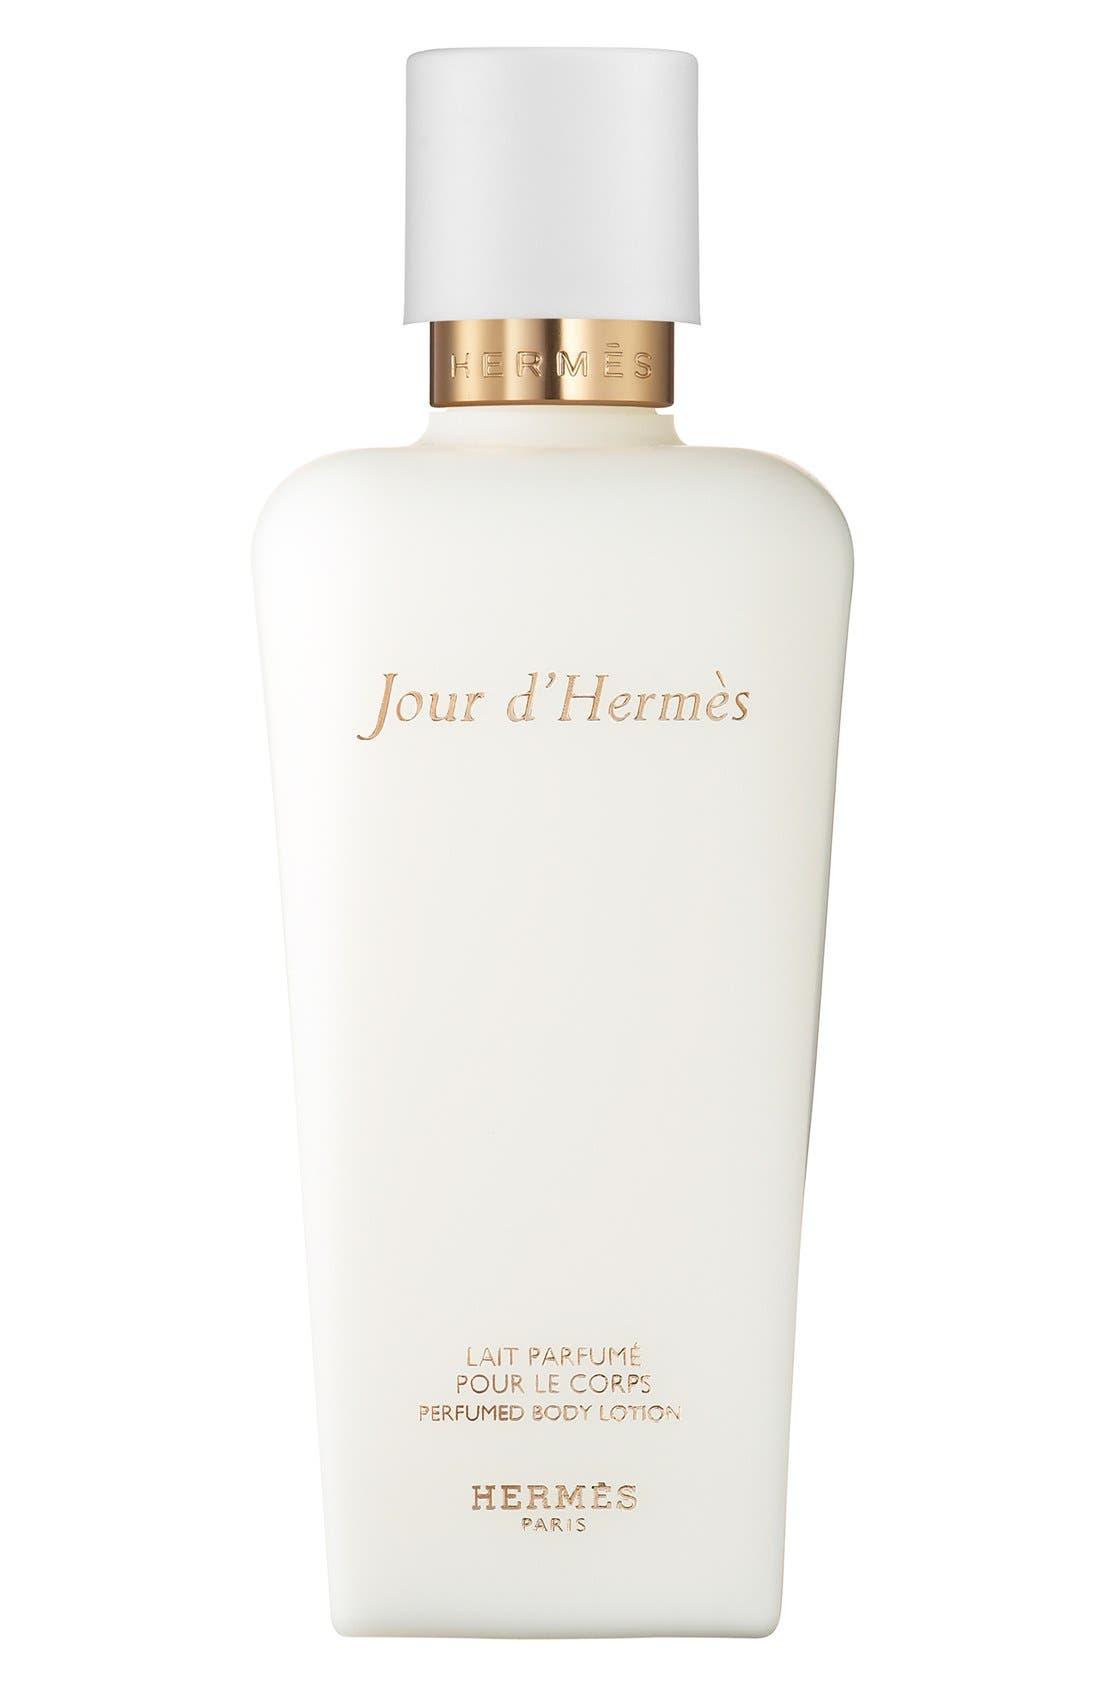 Hermès Jour d'Hermès - Perfumed body lotion